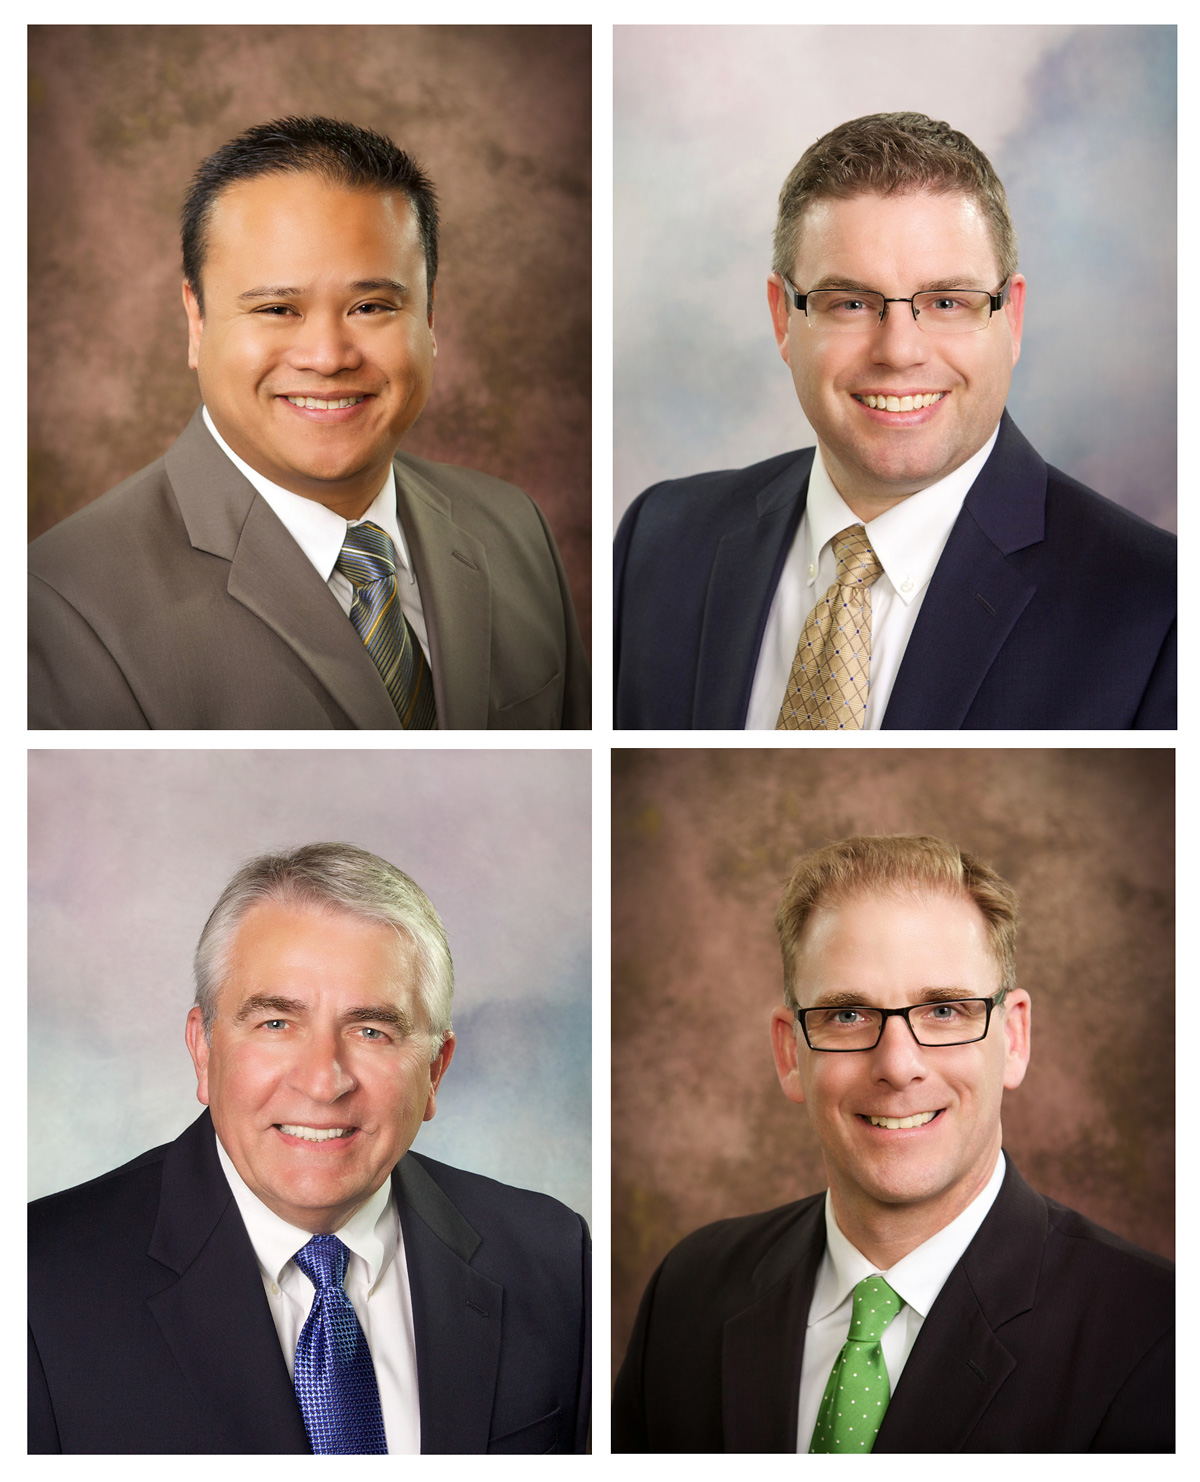 business headshots of Boise men